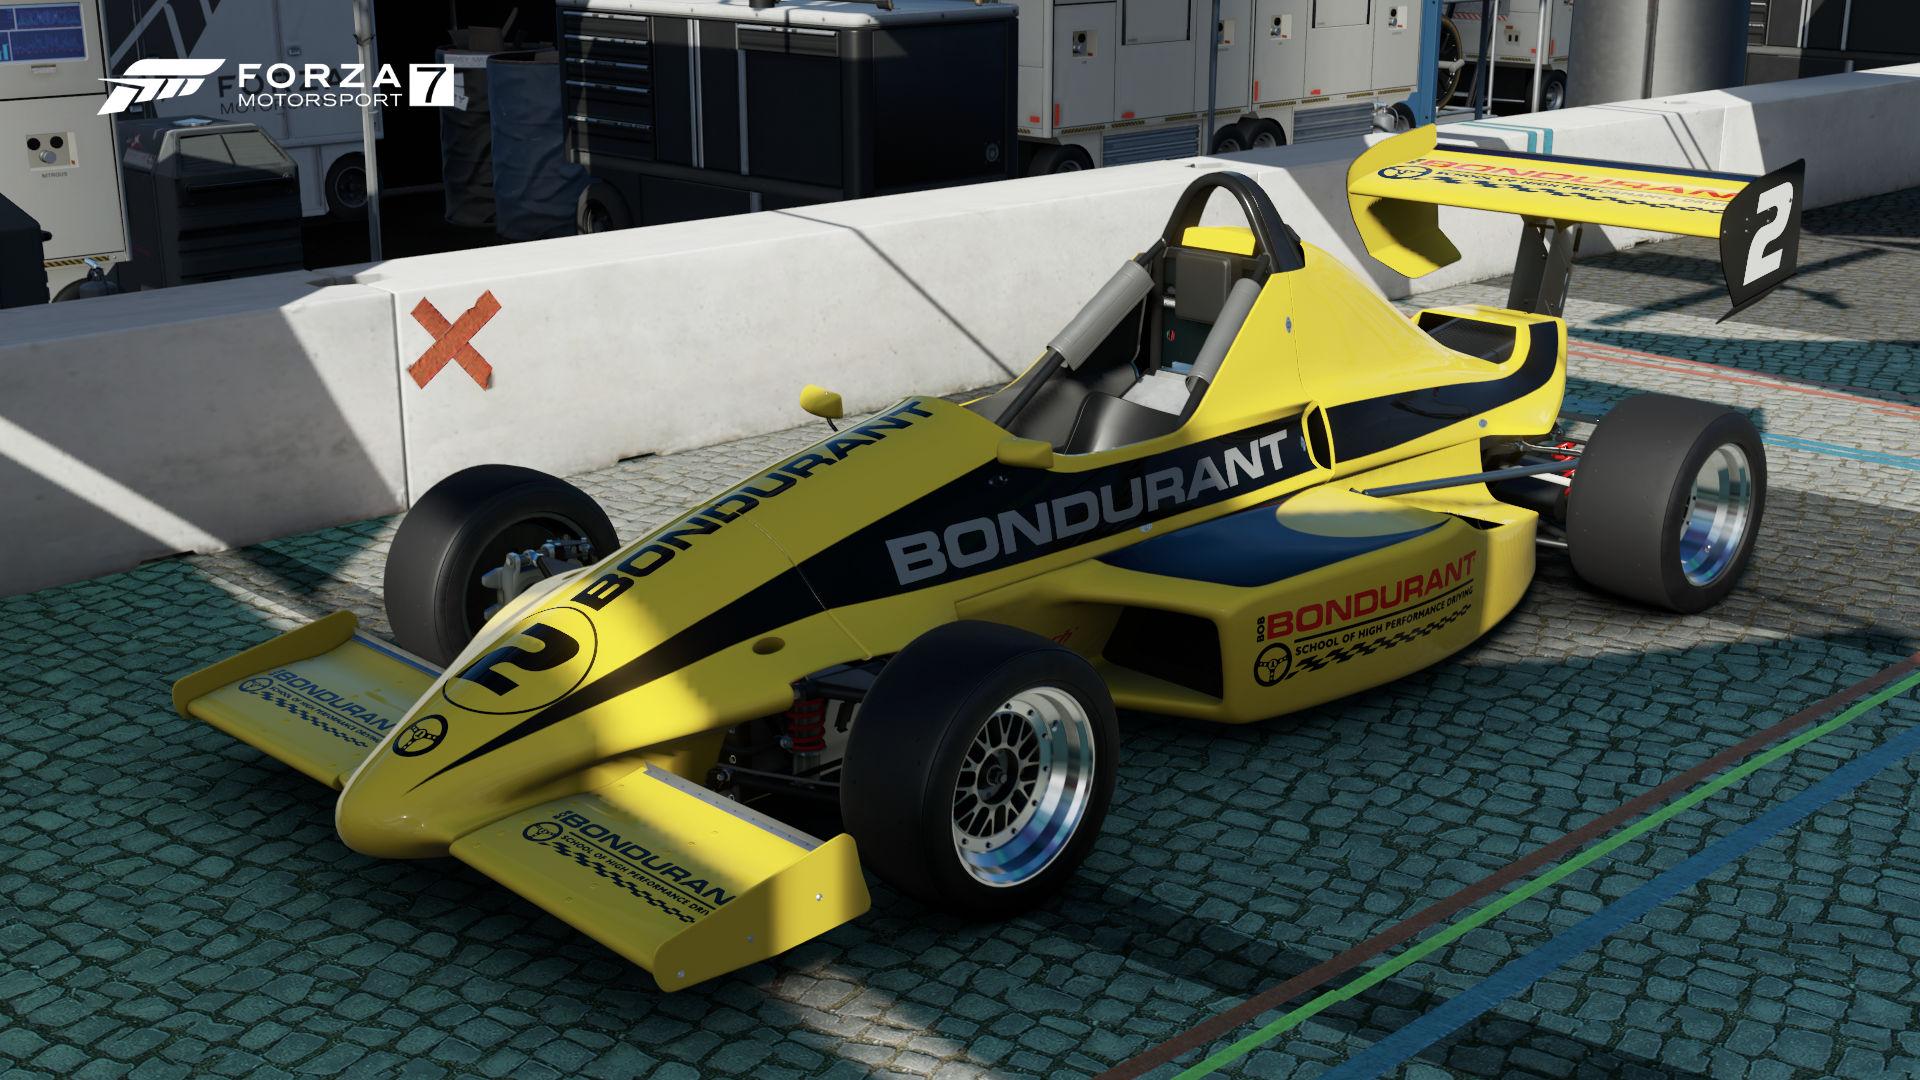 Mazda Formula Mazda Forza Motorsport Wiki FANDOM Powered By Wikia - Formula mazda